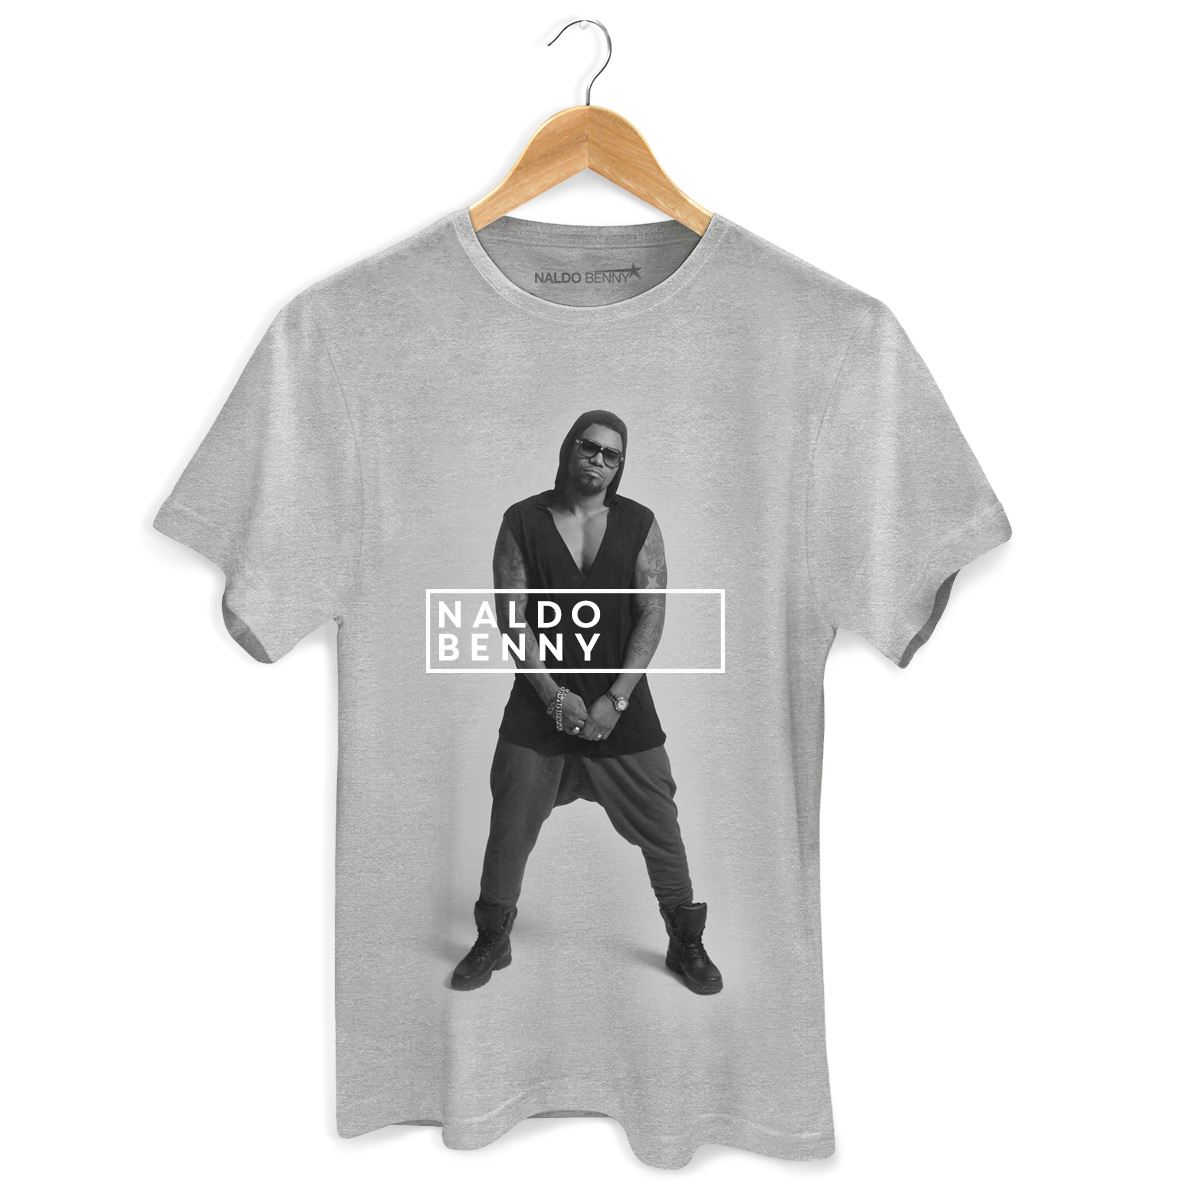 Camiseta Masculina Naldo Benny Foto